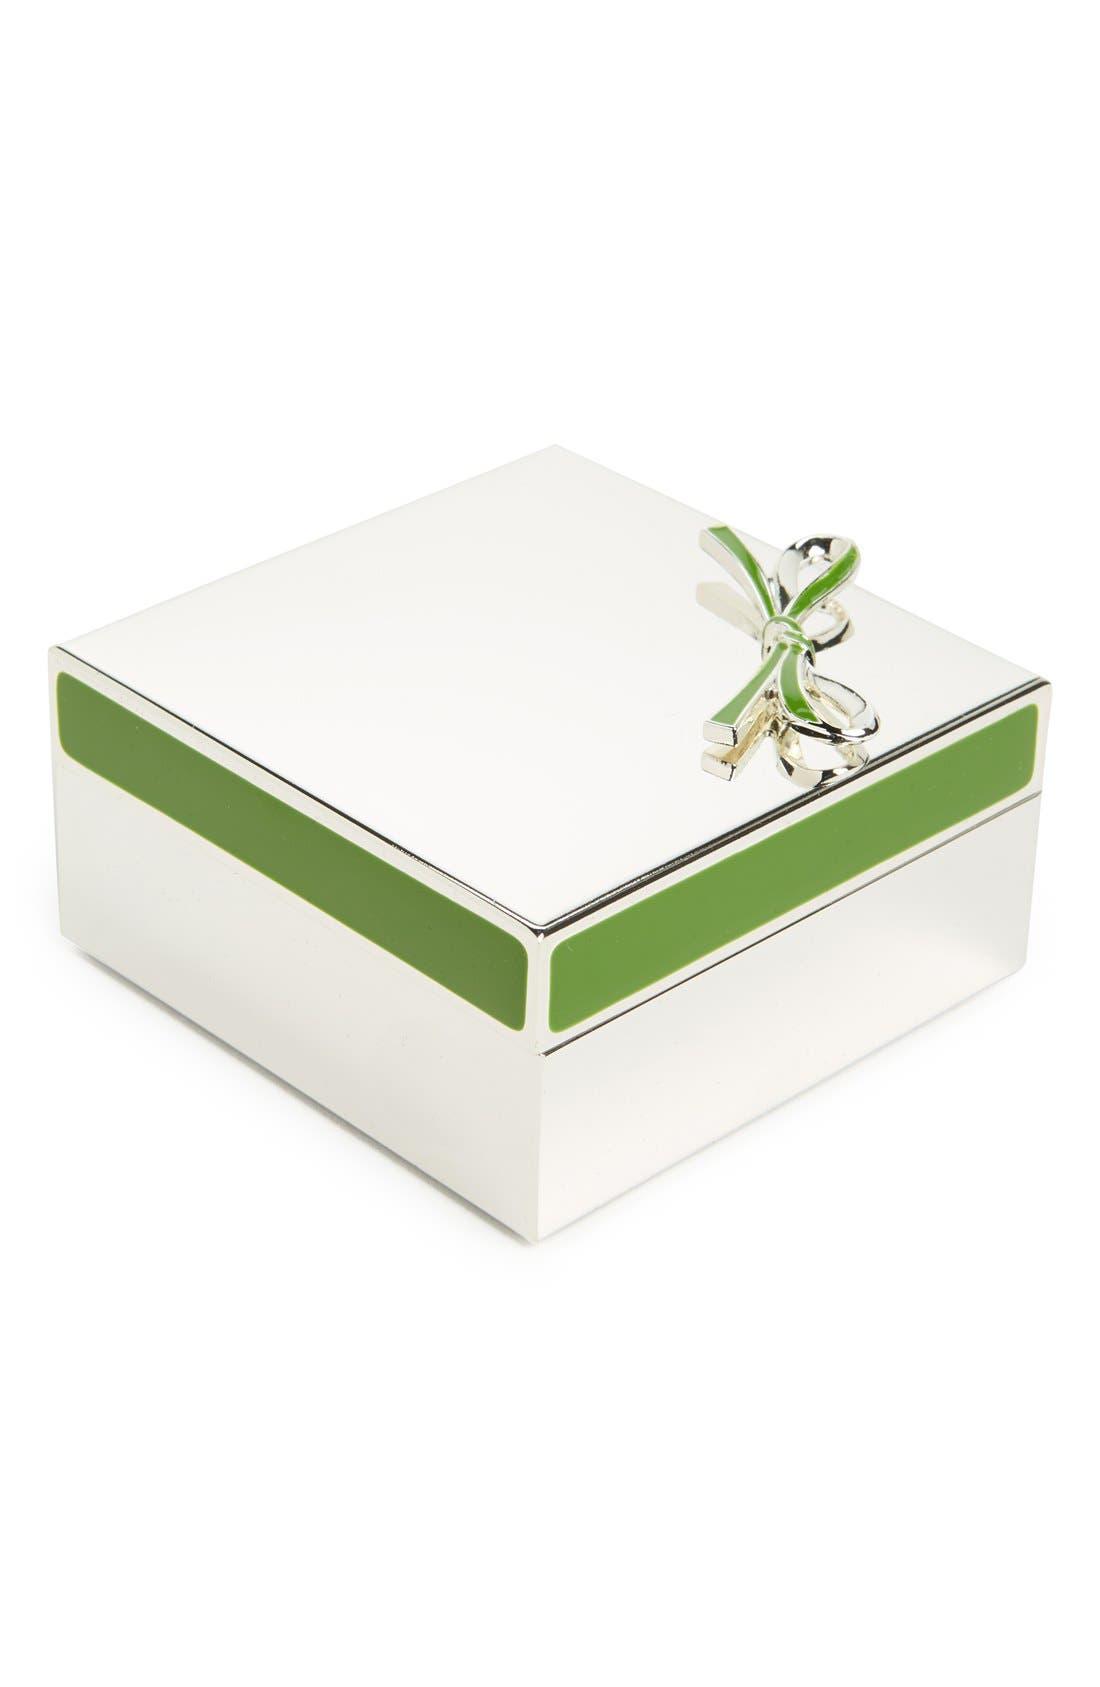 Main Image - kate spade new york 'vienna lane' keepsake box